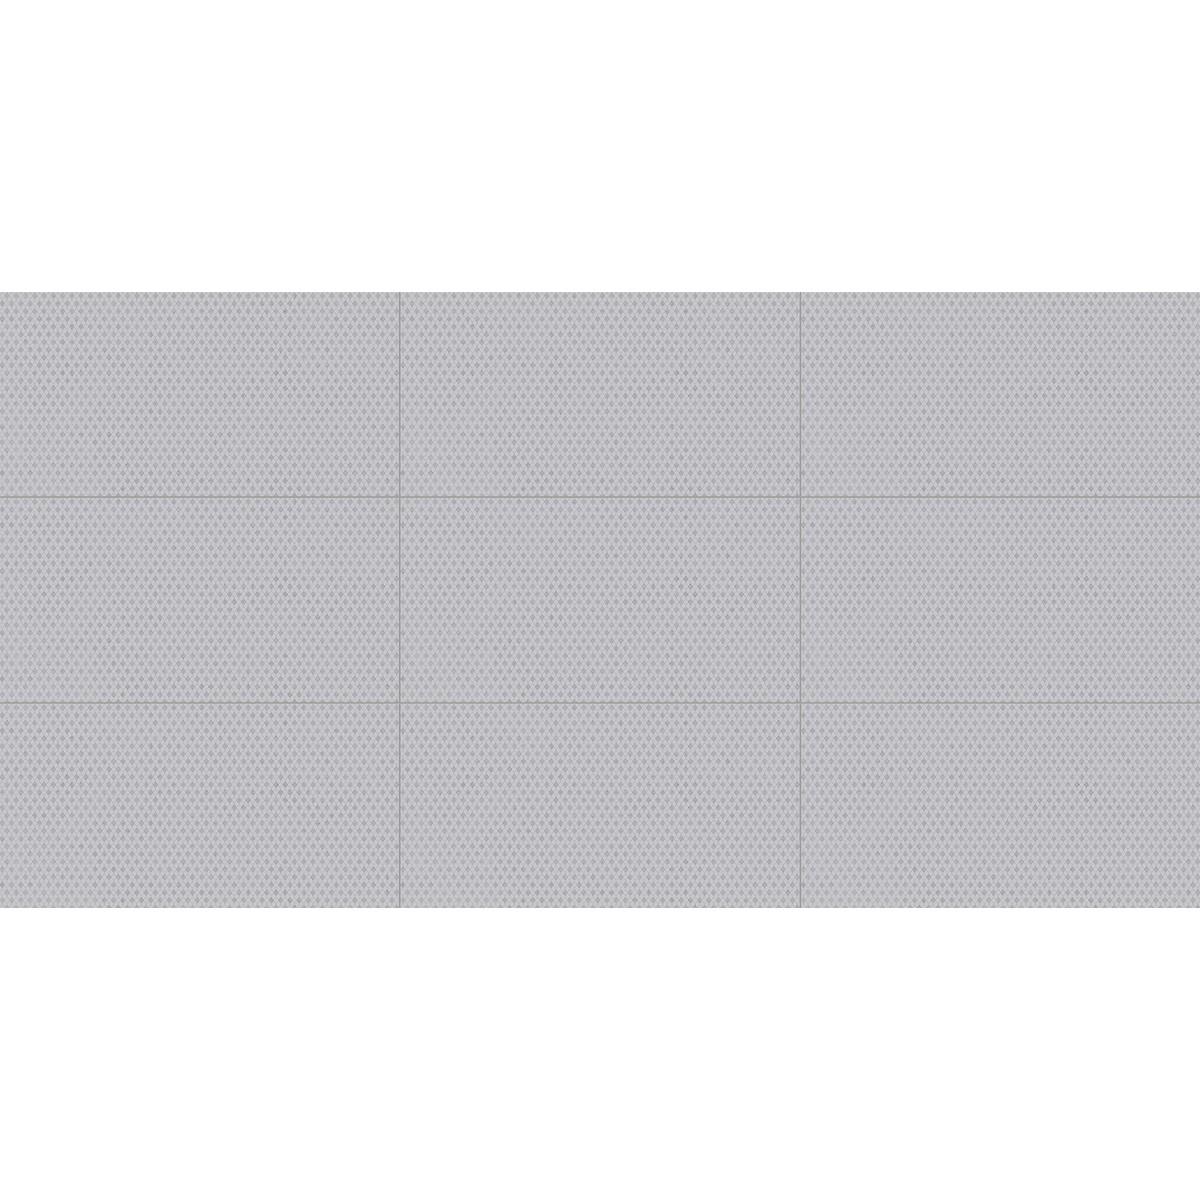 Gresalato 35x70 Platina Decor Polido - 35 MT